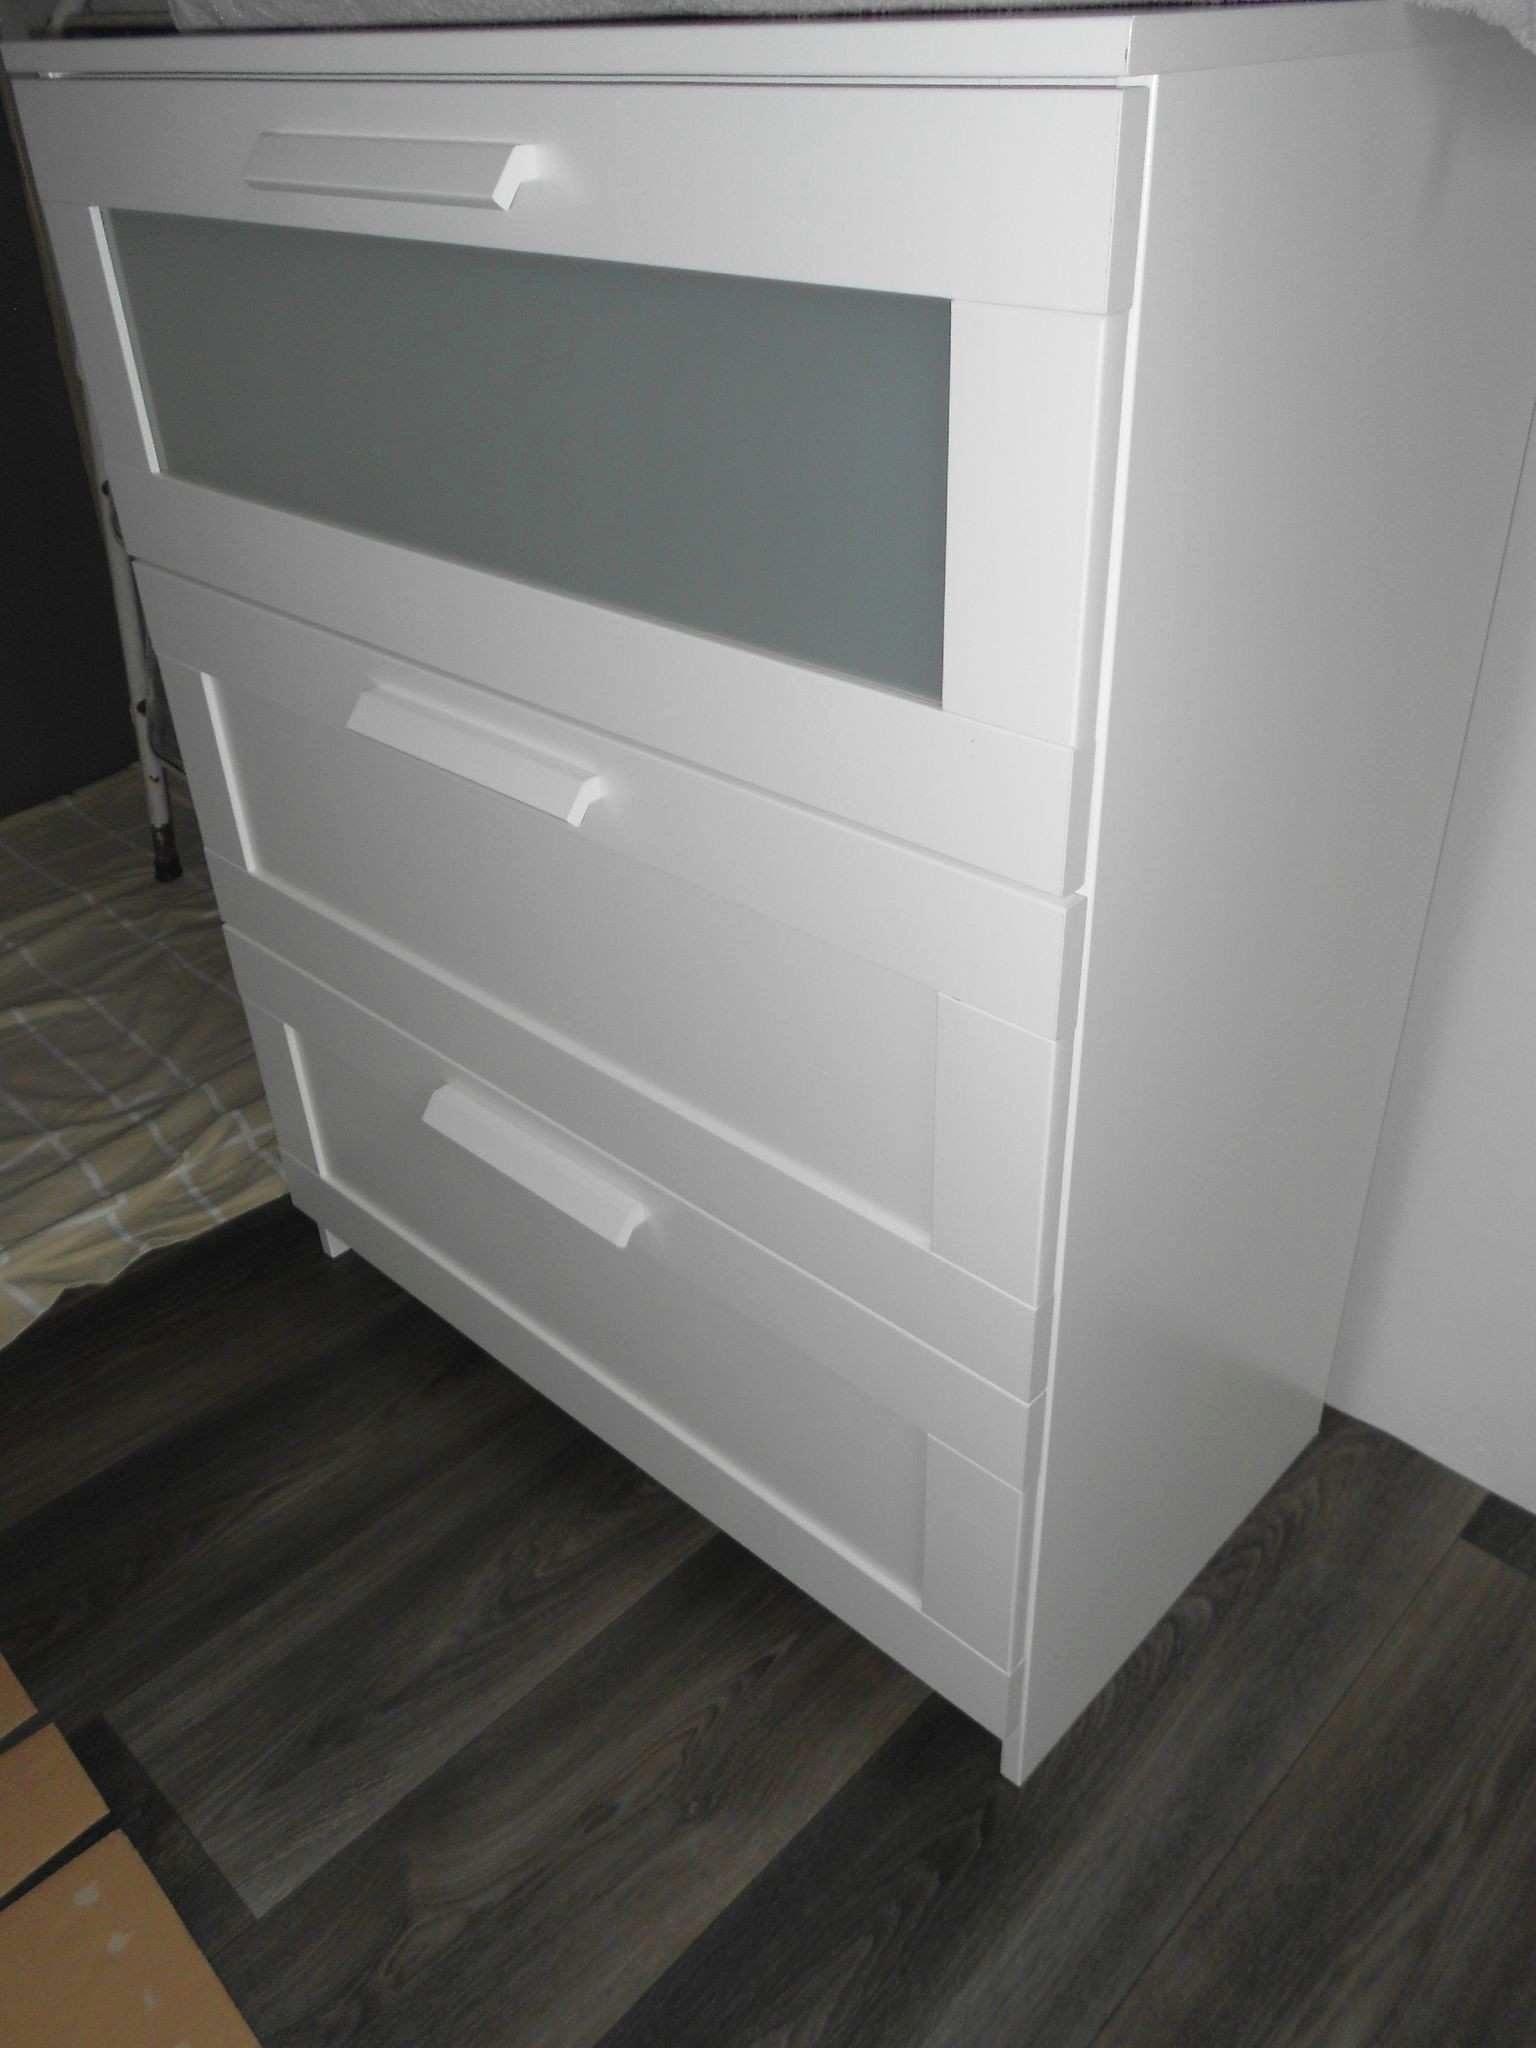 Lit King Size 200×200 Ikea Frais Boxspringbett 200—200 Ikea Typen Lit Design King Size Ikea Bett 200